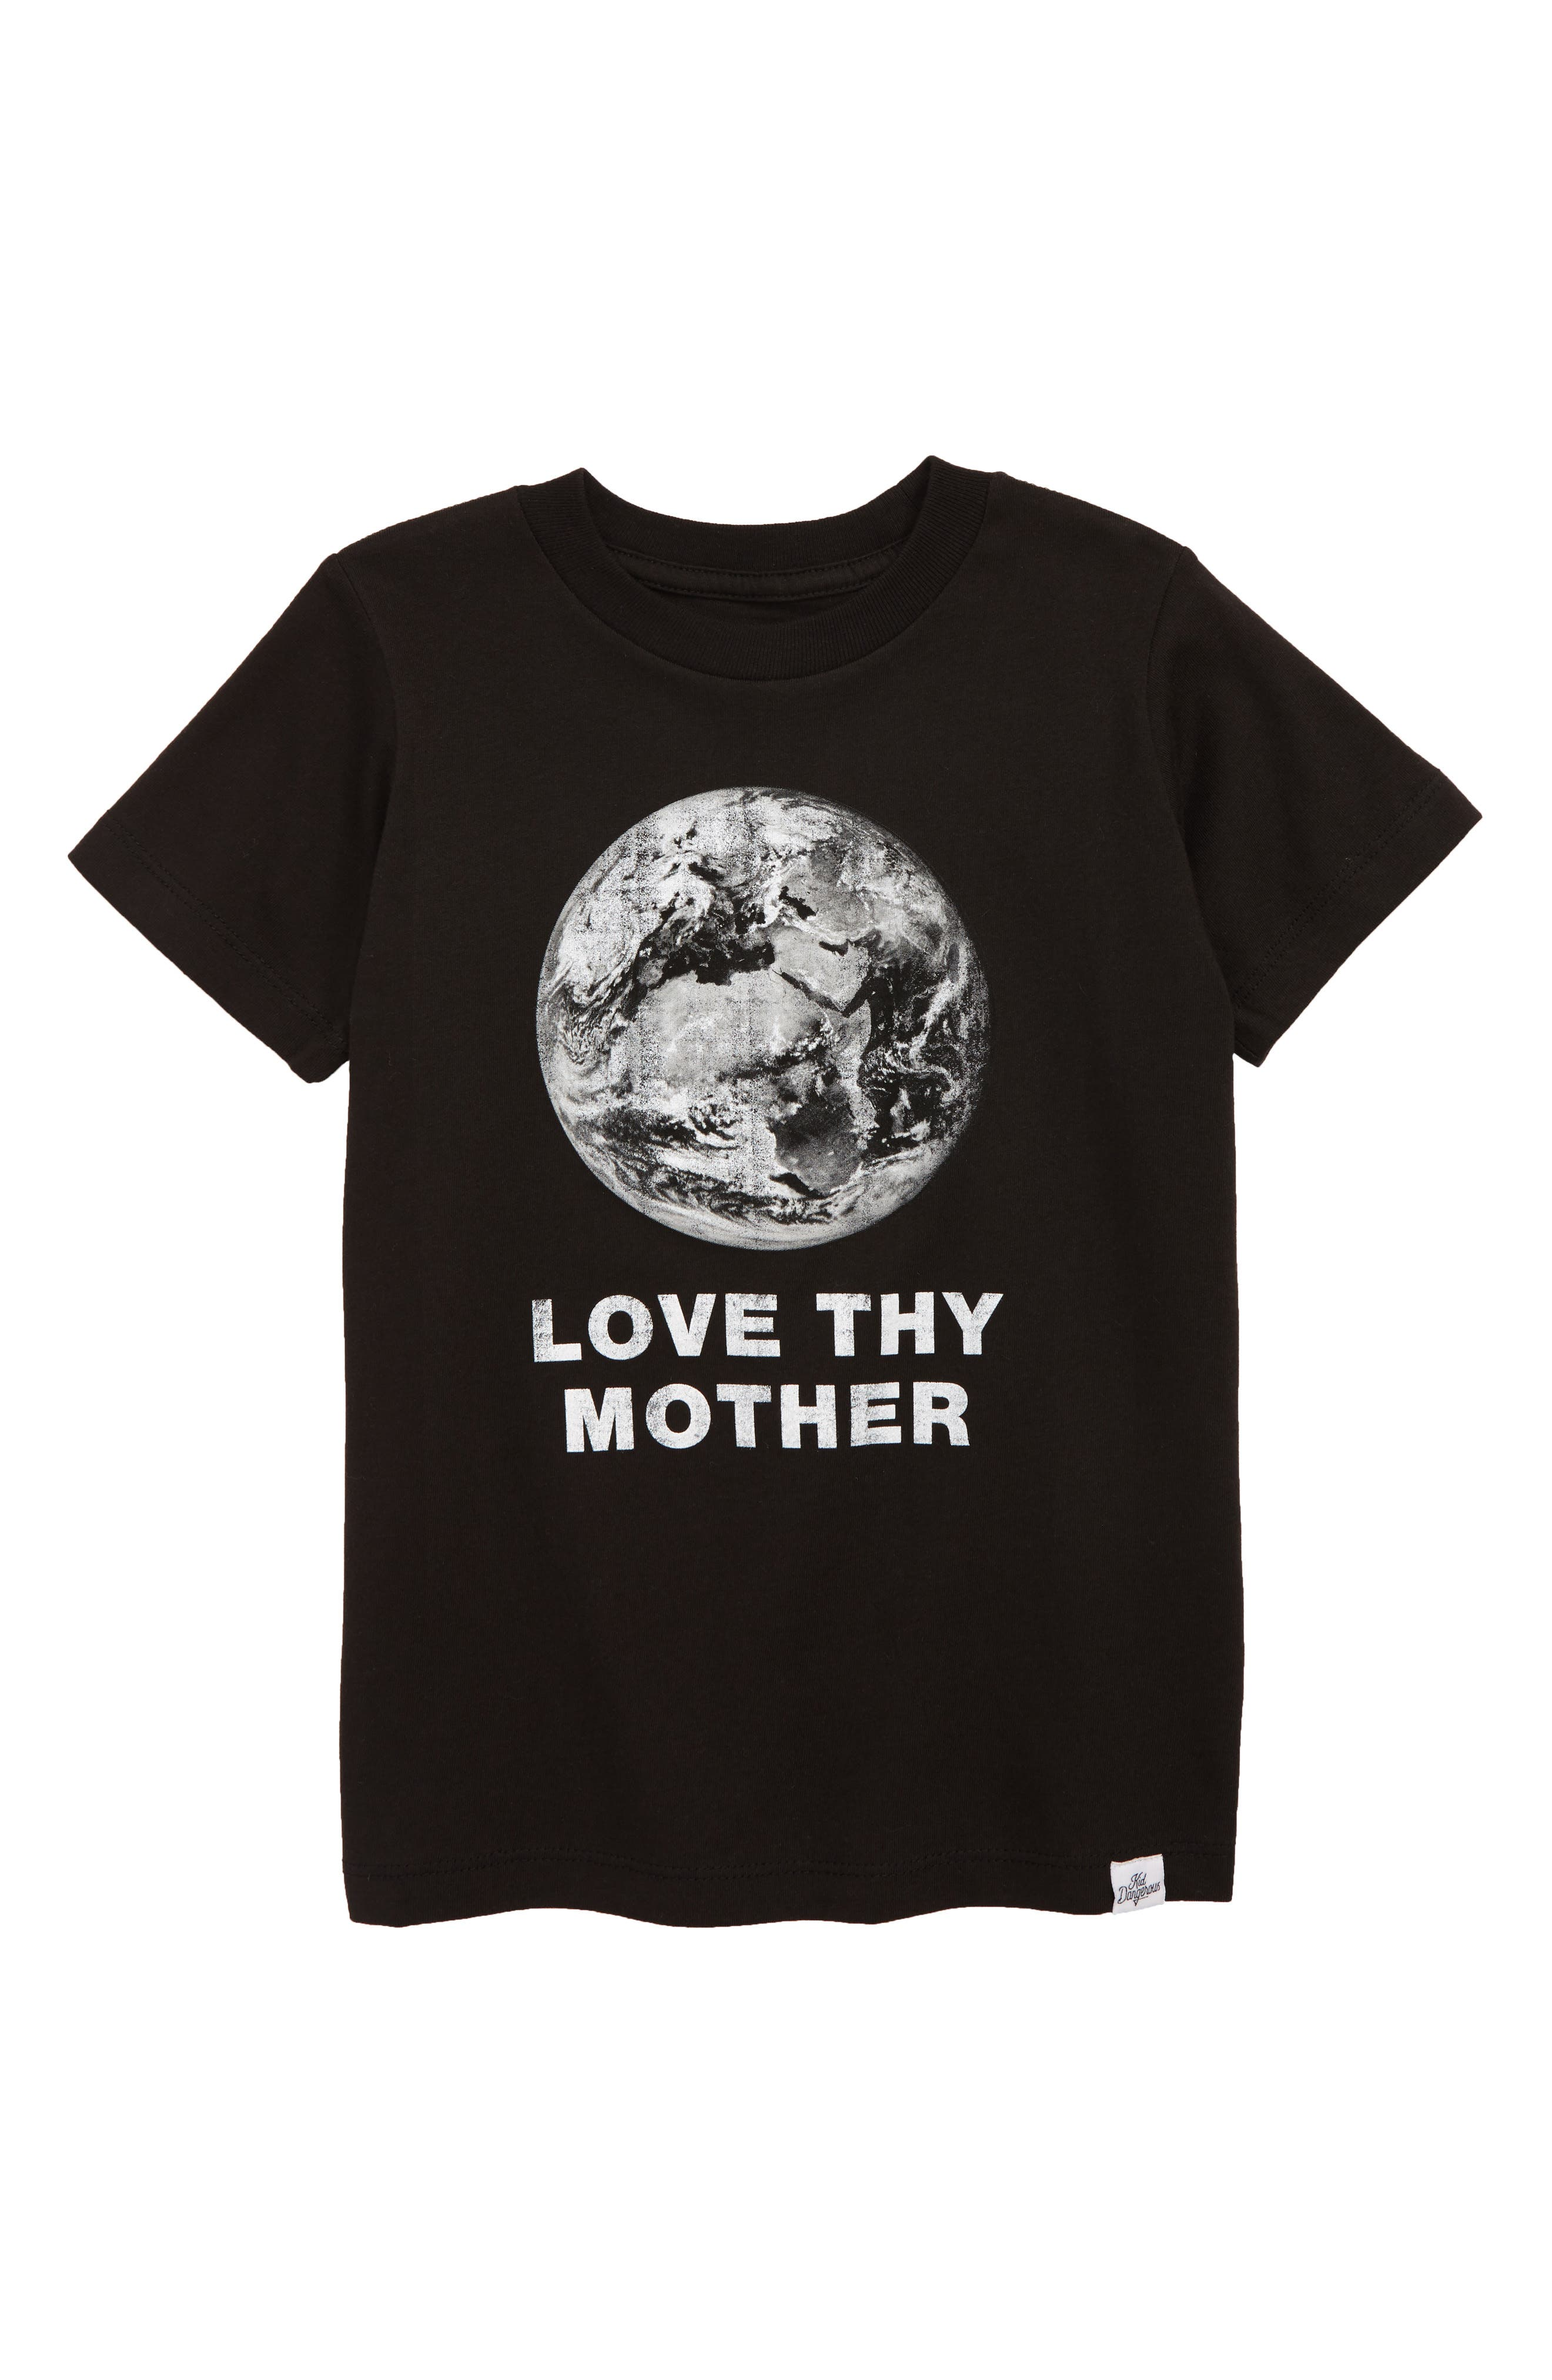 Boys Kid Dangerous Love Thy Mother Graphic TShirt Size 8  Black